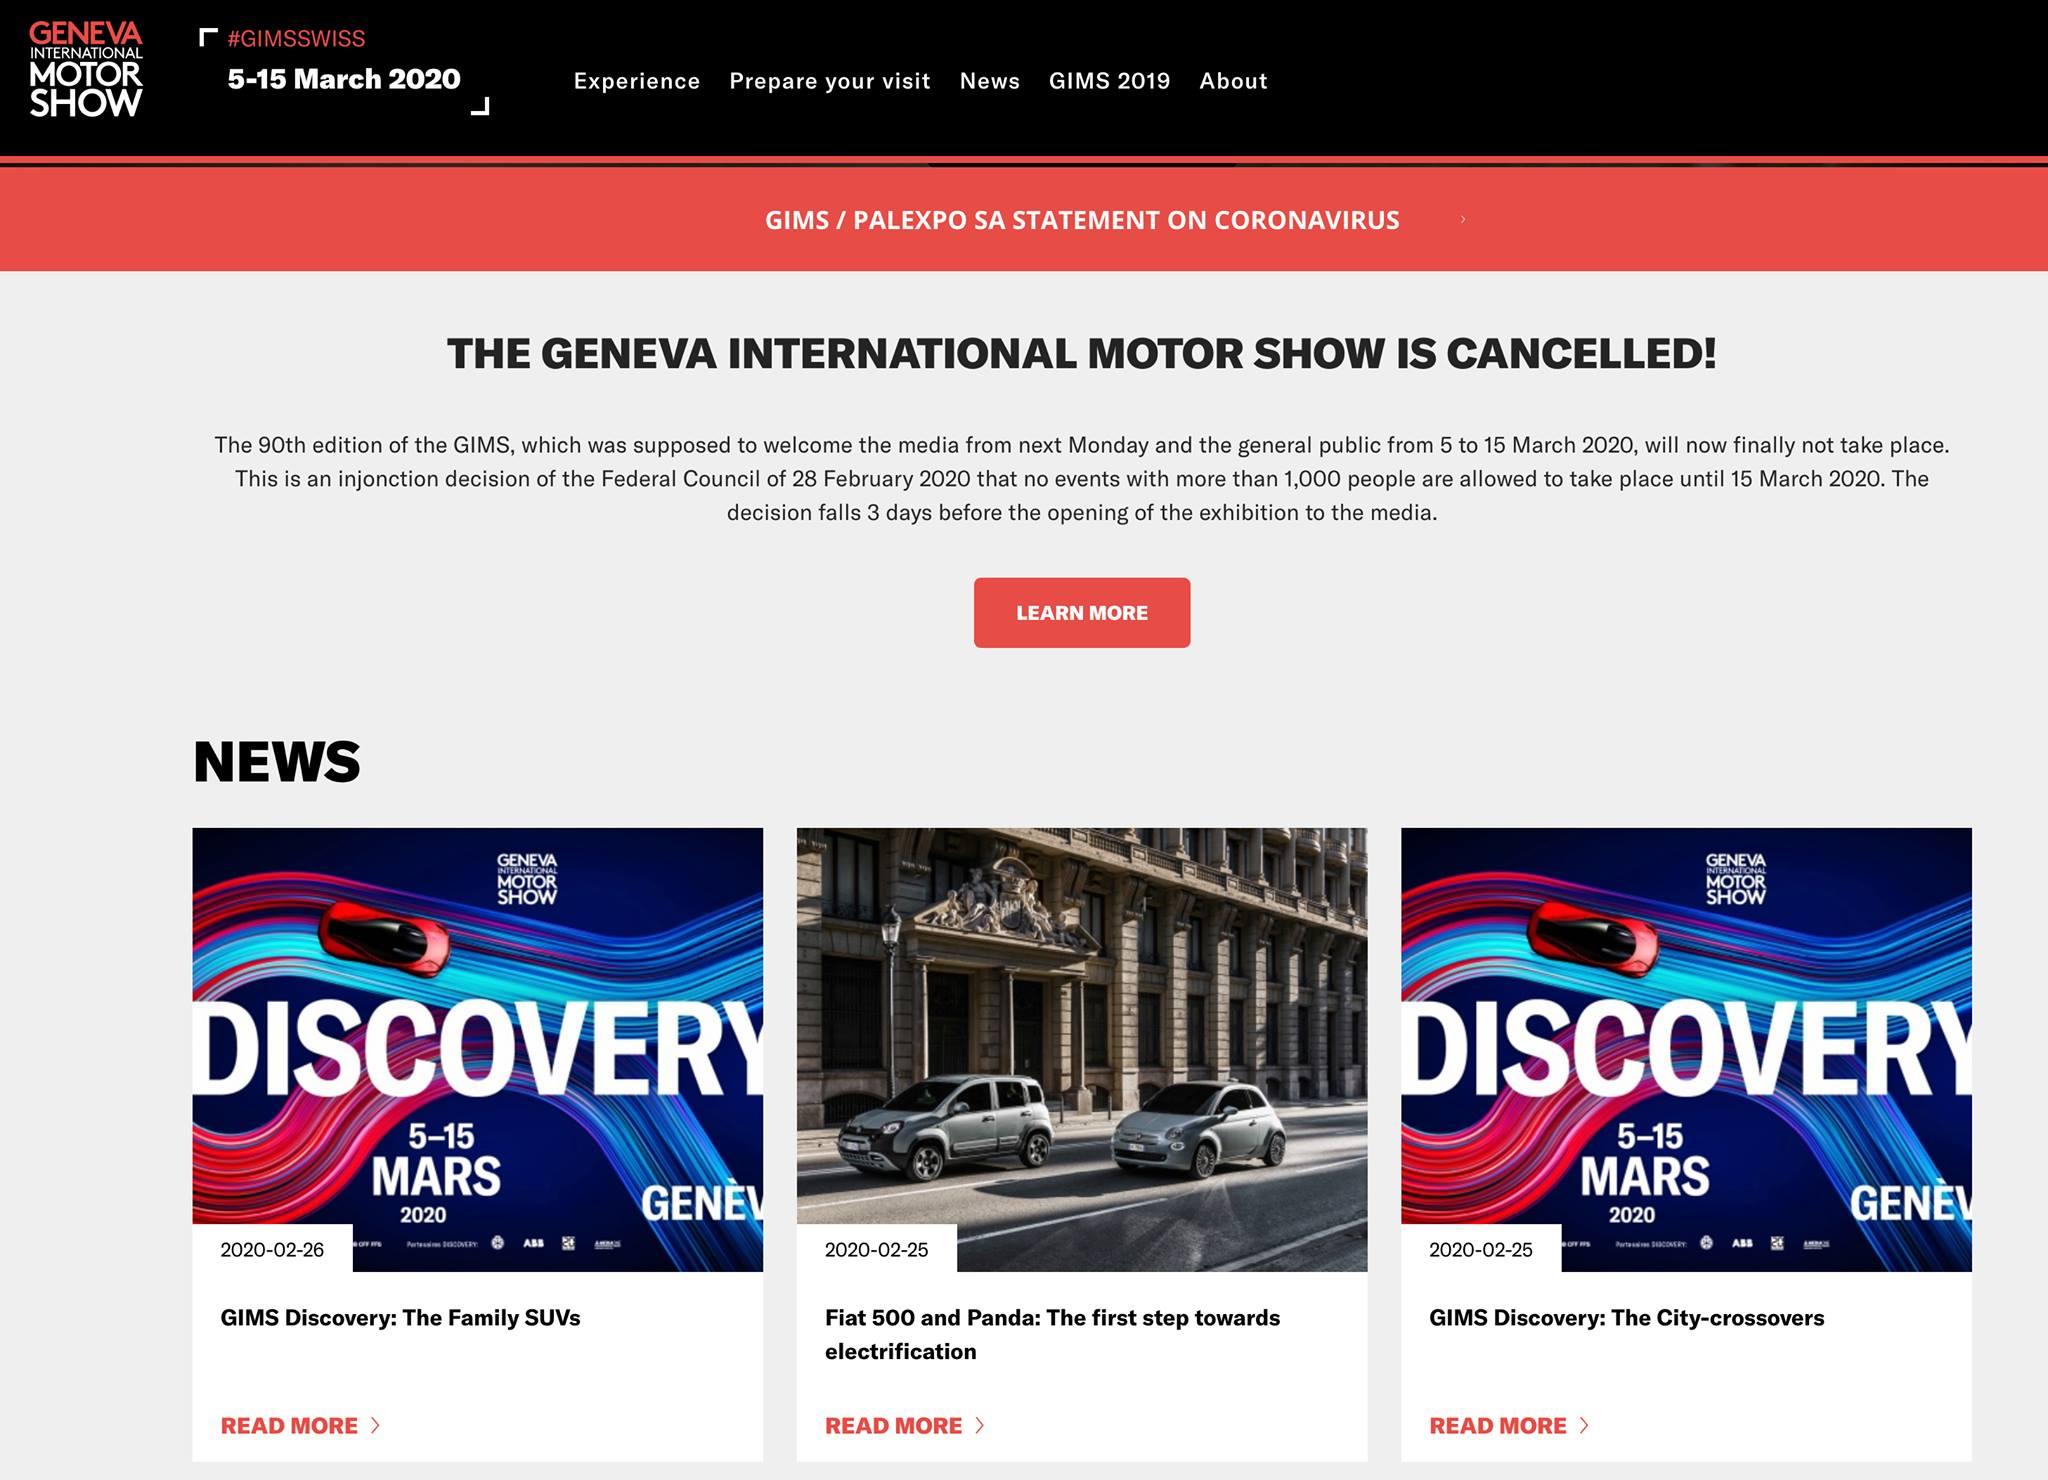 Es oficial se cancela el Auto Show de Ginebra